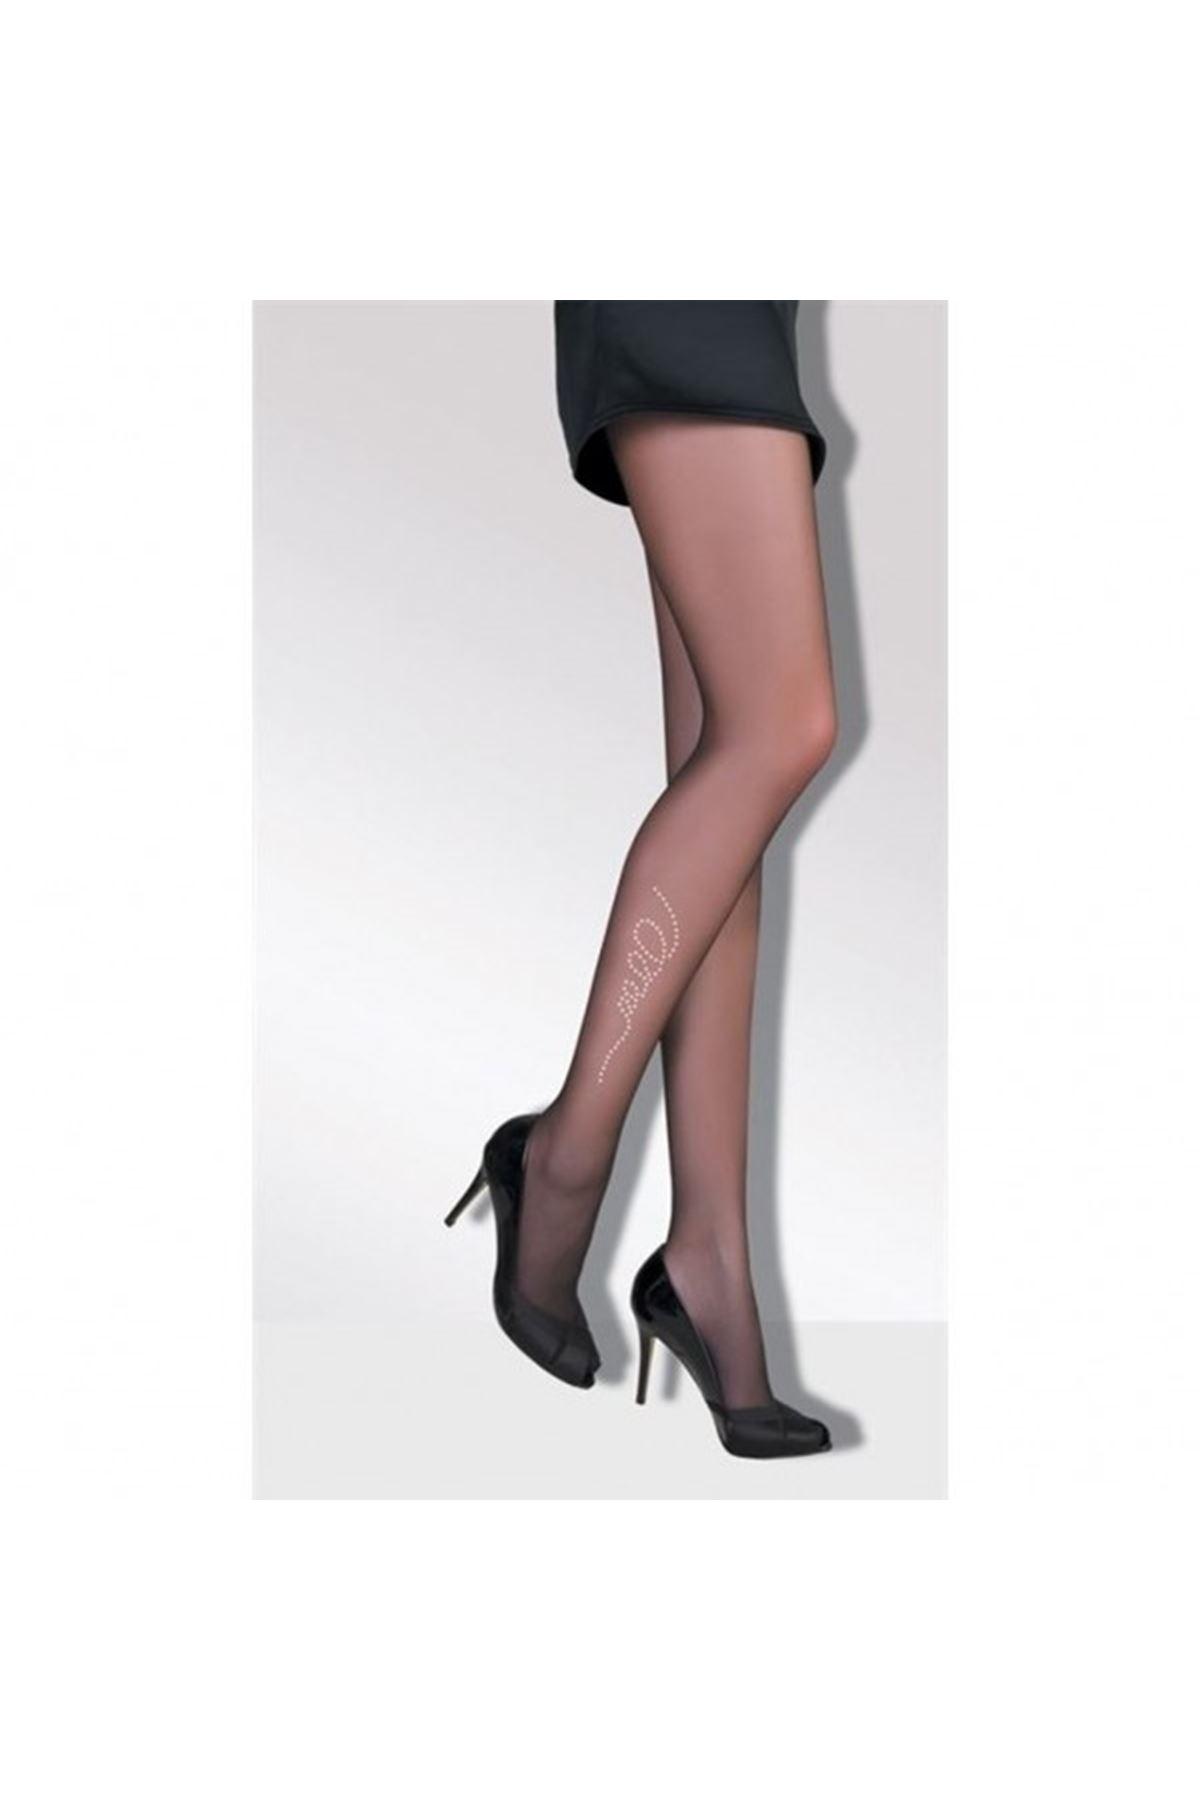 Daymod İnci Taşlı Külotlu Çorap Siyah